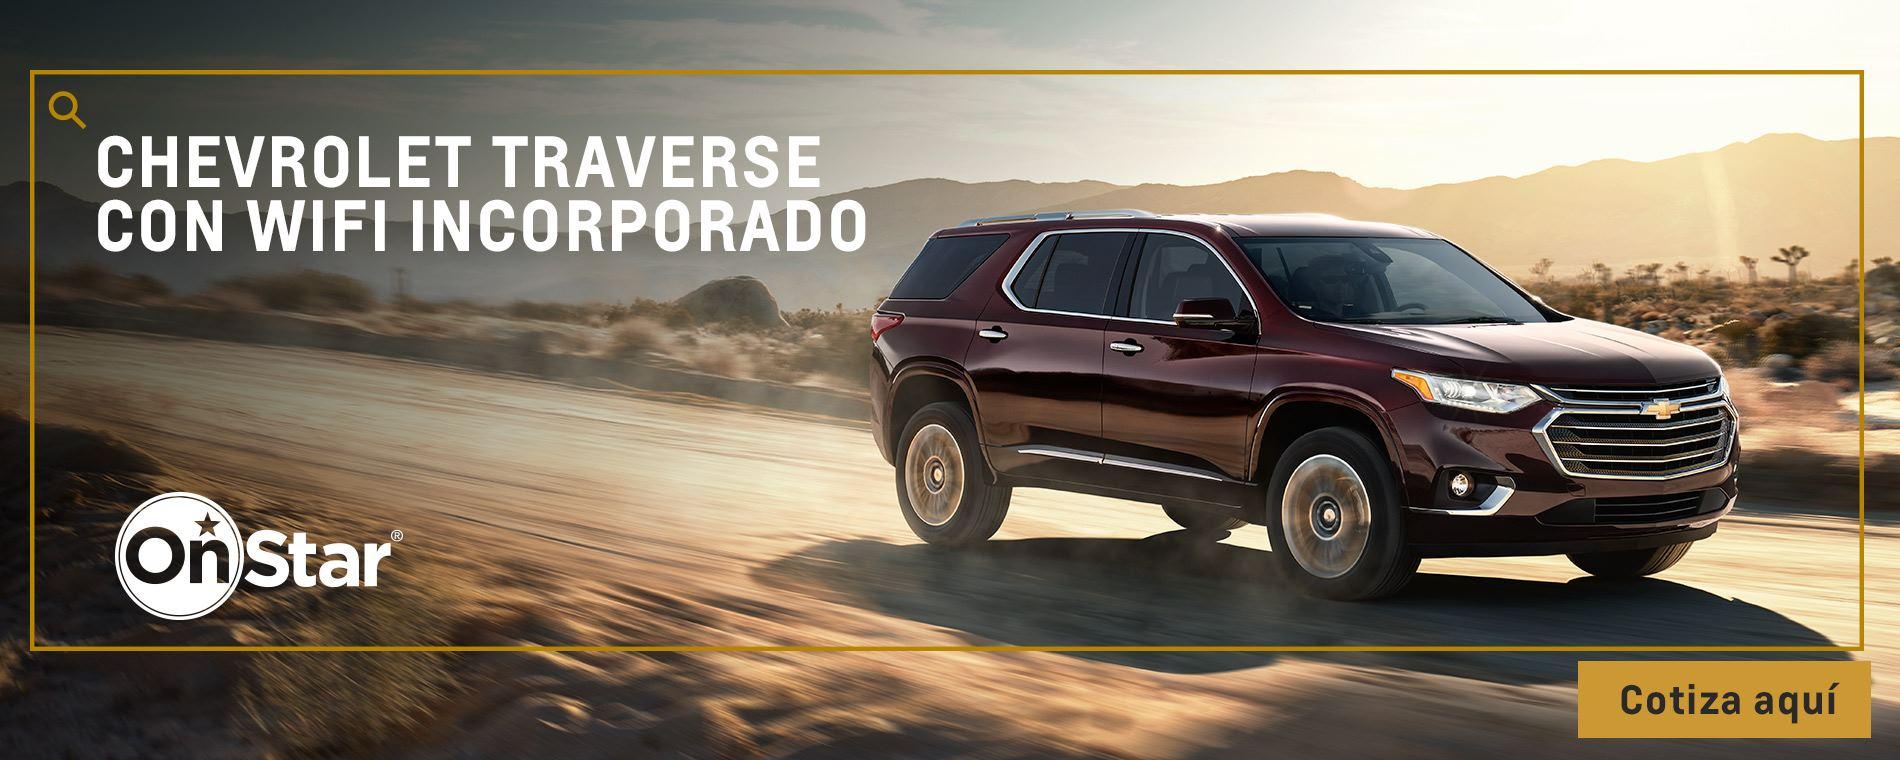 Chevrolet Autolarte - camioneta premium - Traverse Wifi